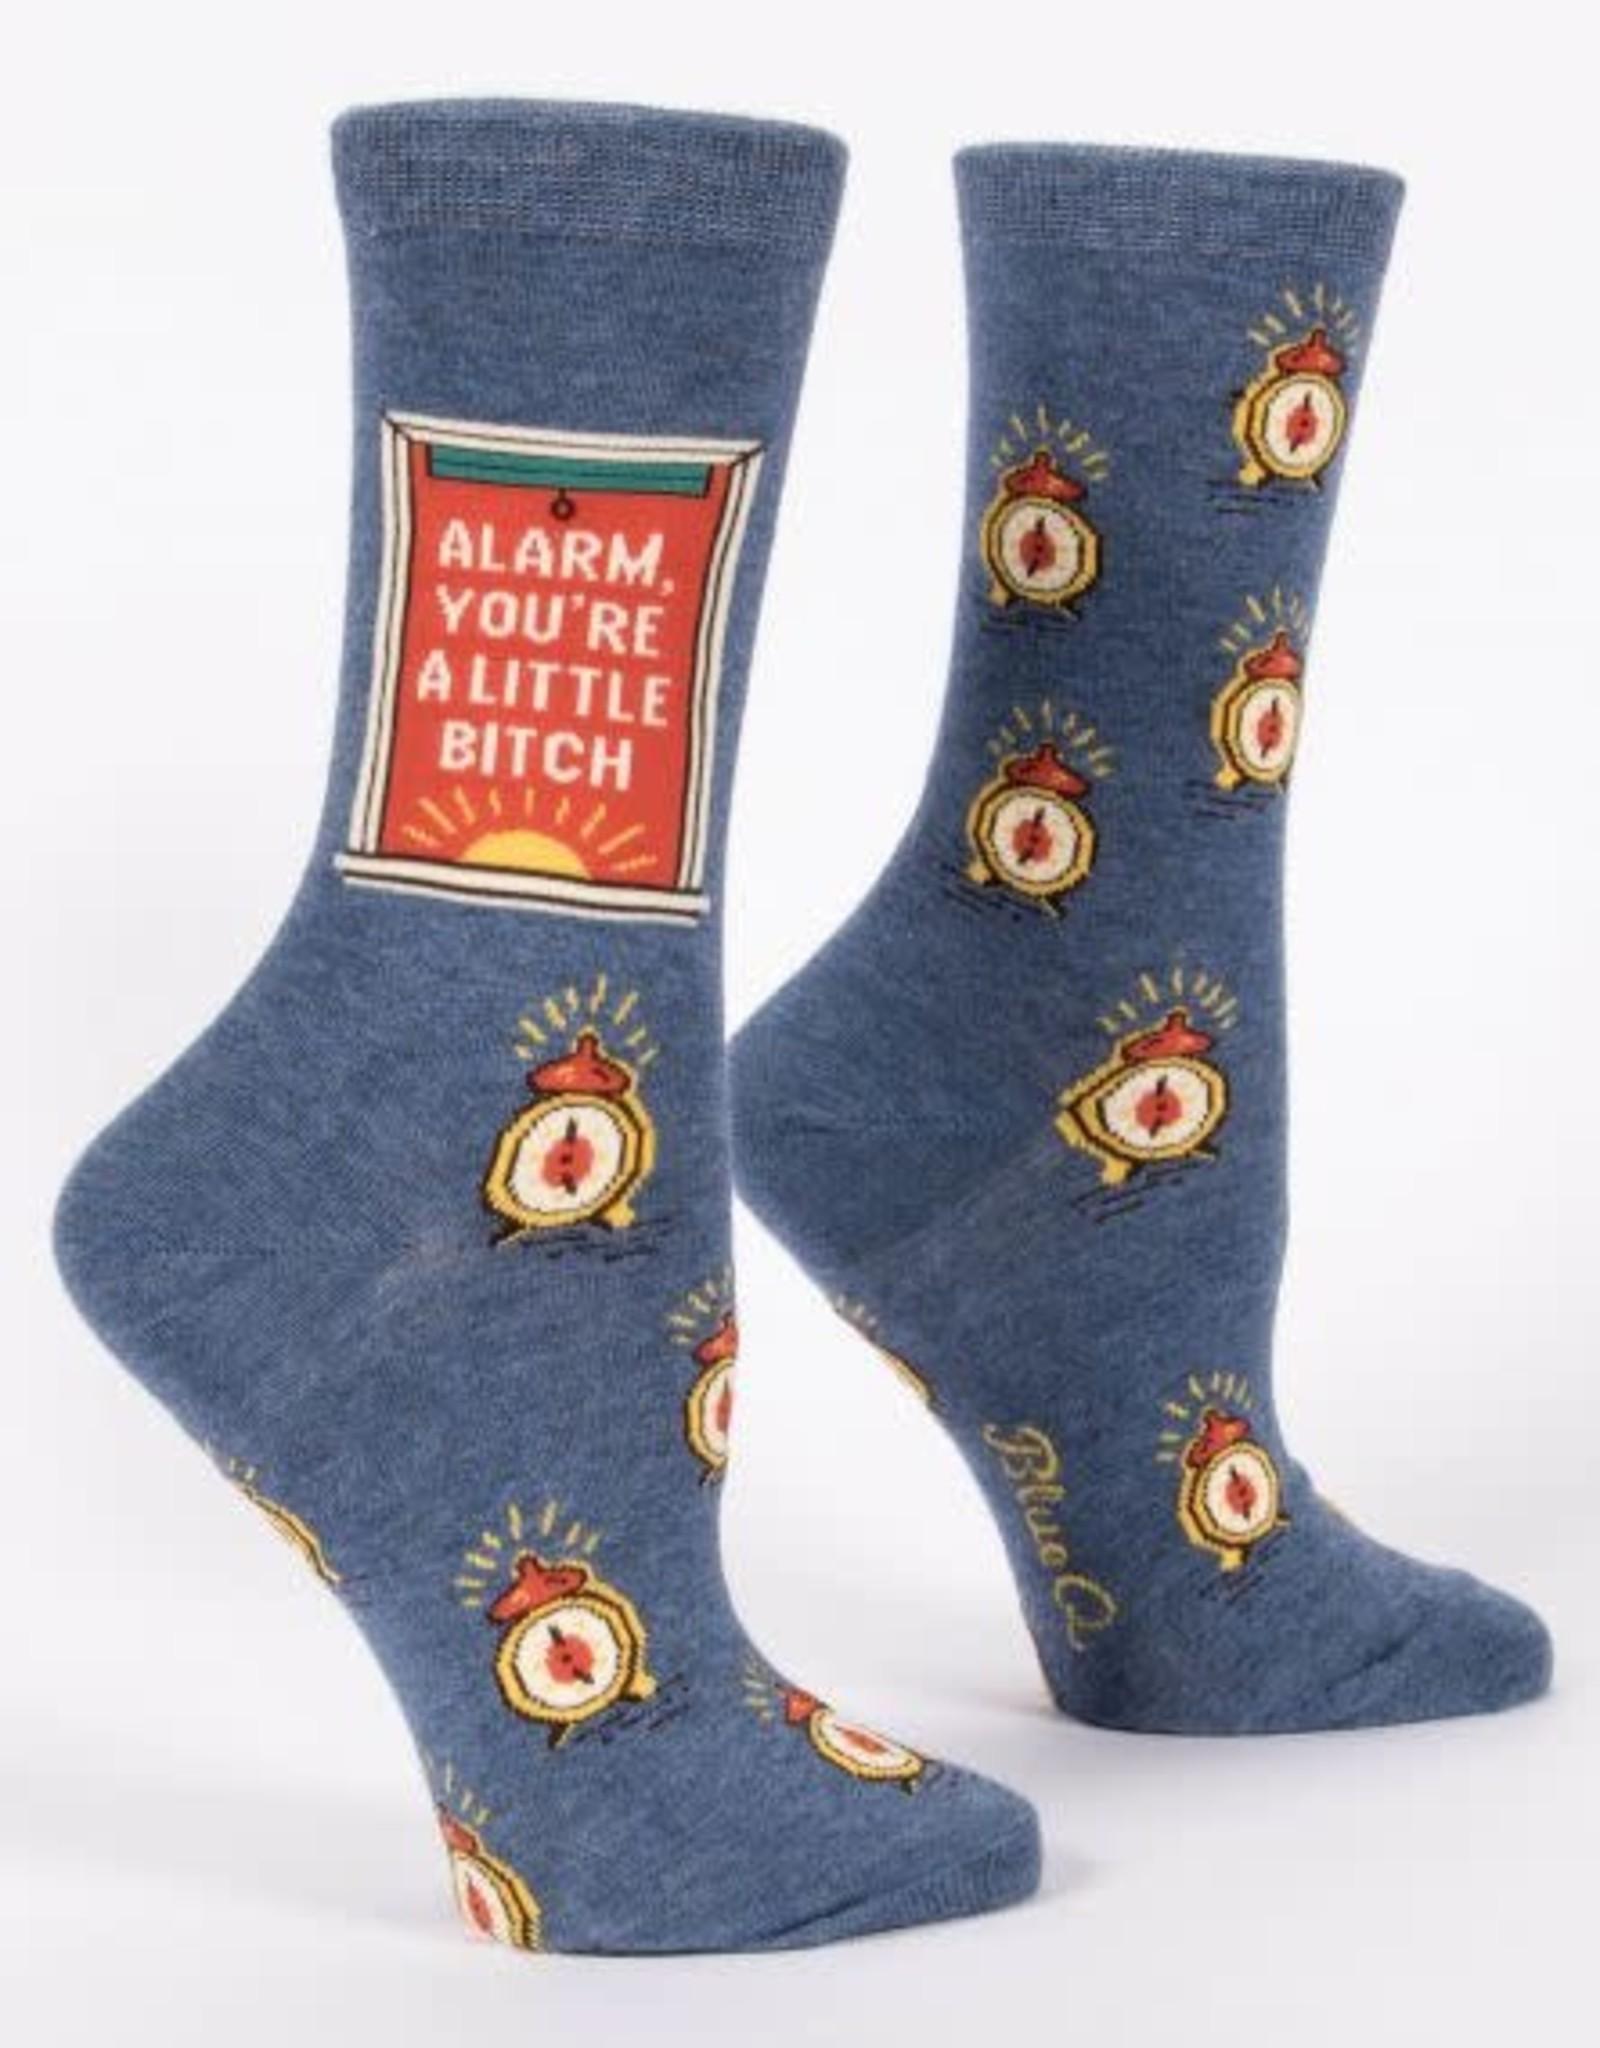 Blue Q Blue Q Women's Crew Socks (More!) Alarm Bitch